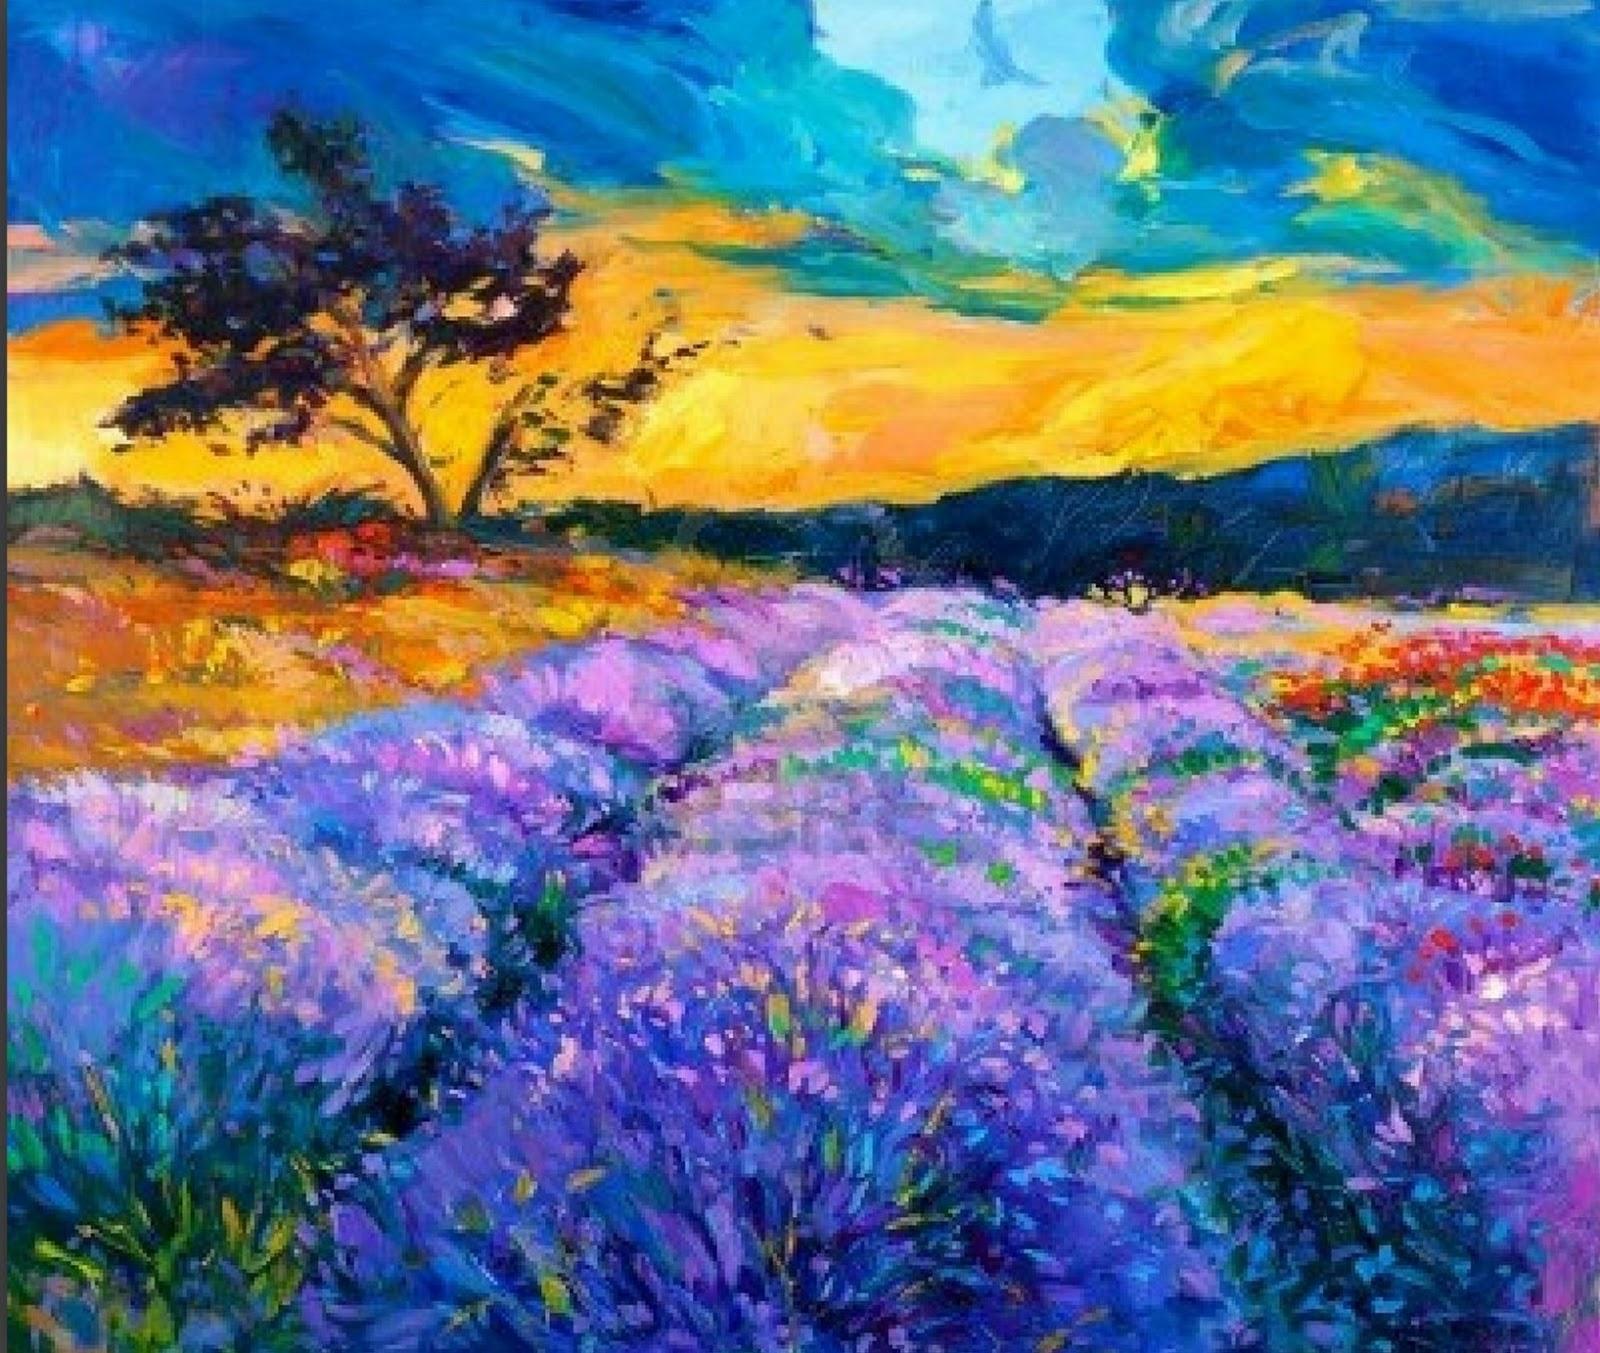 Fotos De Pinturas Famosas De Flores - Cómo pintar flores famosas eHow en Español